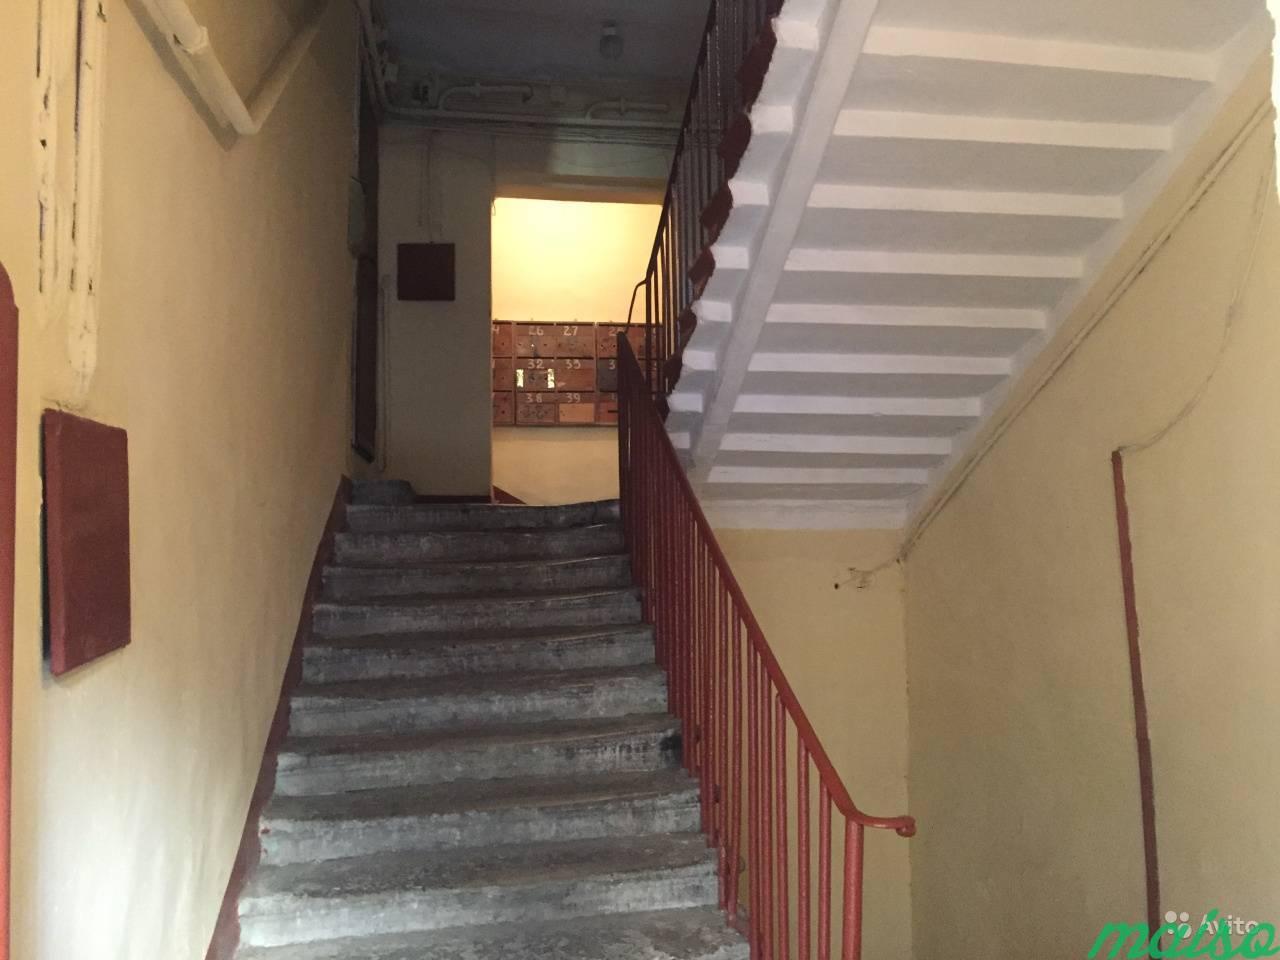 Комната 18.5 м² в 4-к, 5/6 эт. в Санкт-Петербурге. Фото 9